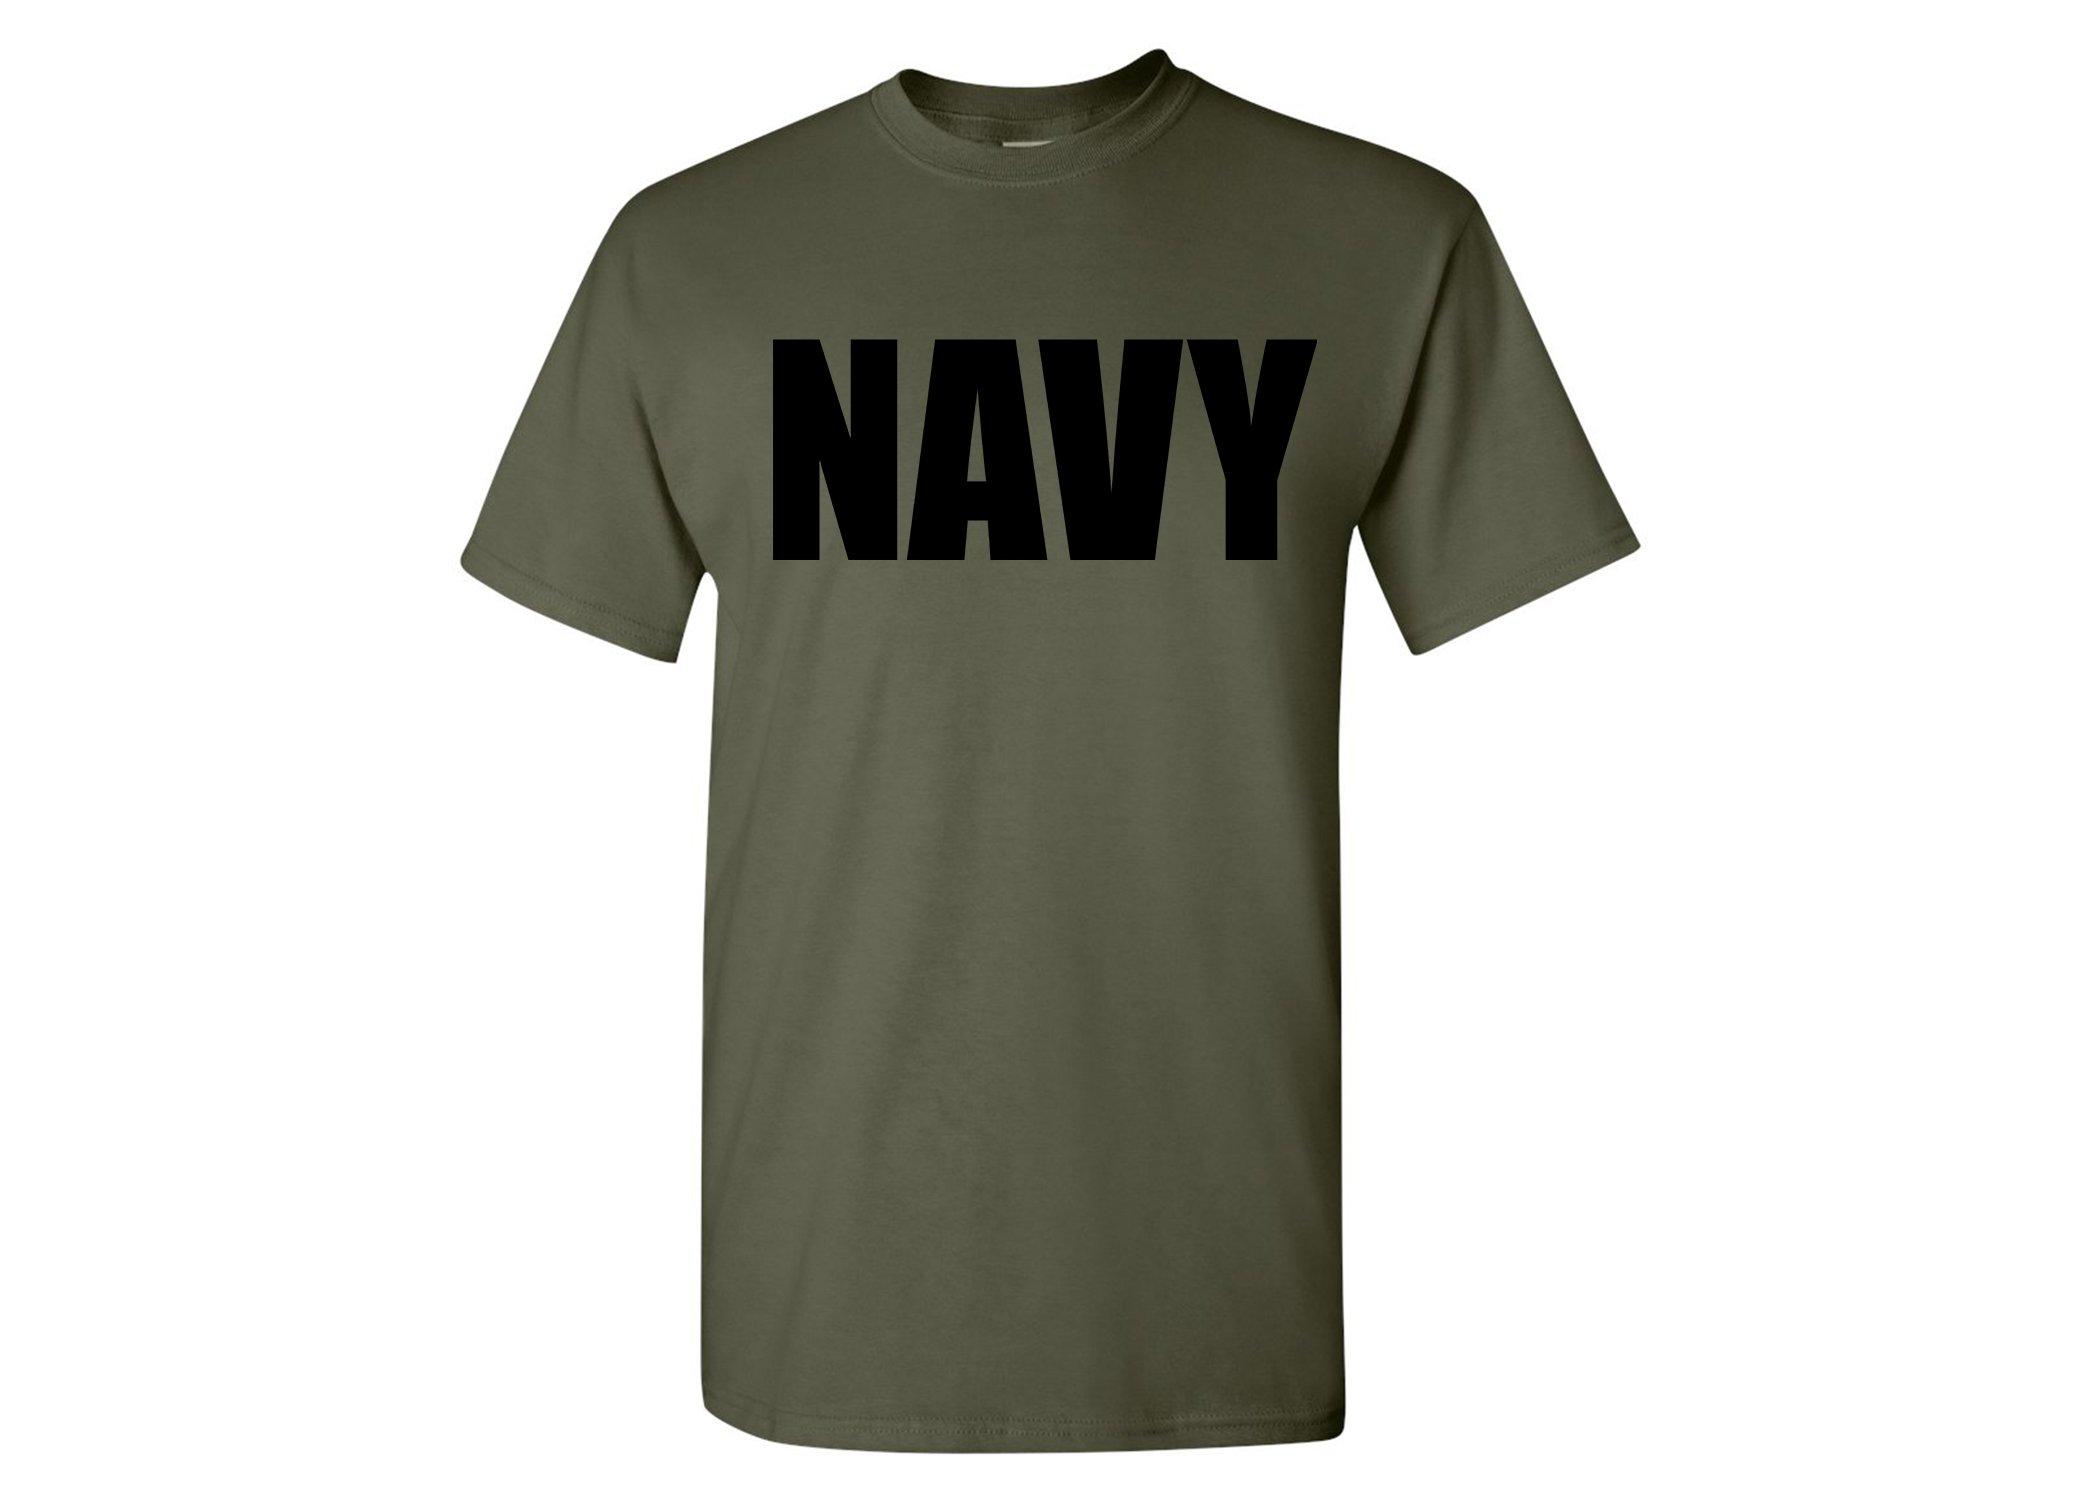 Rogue River Tactical Military Green US Navy PT T-Shirt Unites States Navy USN Tee Shirt (XL)